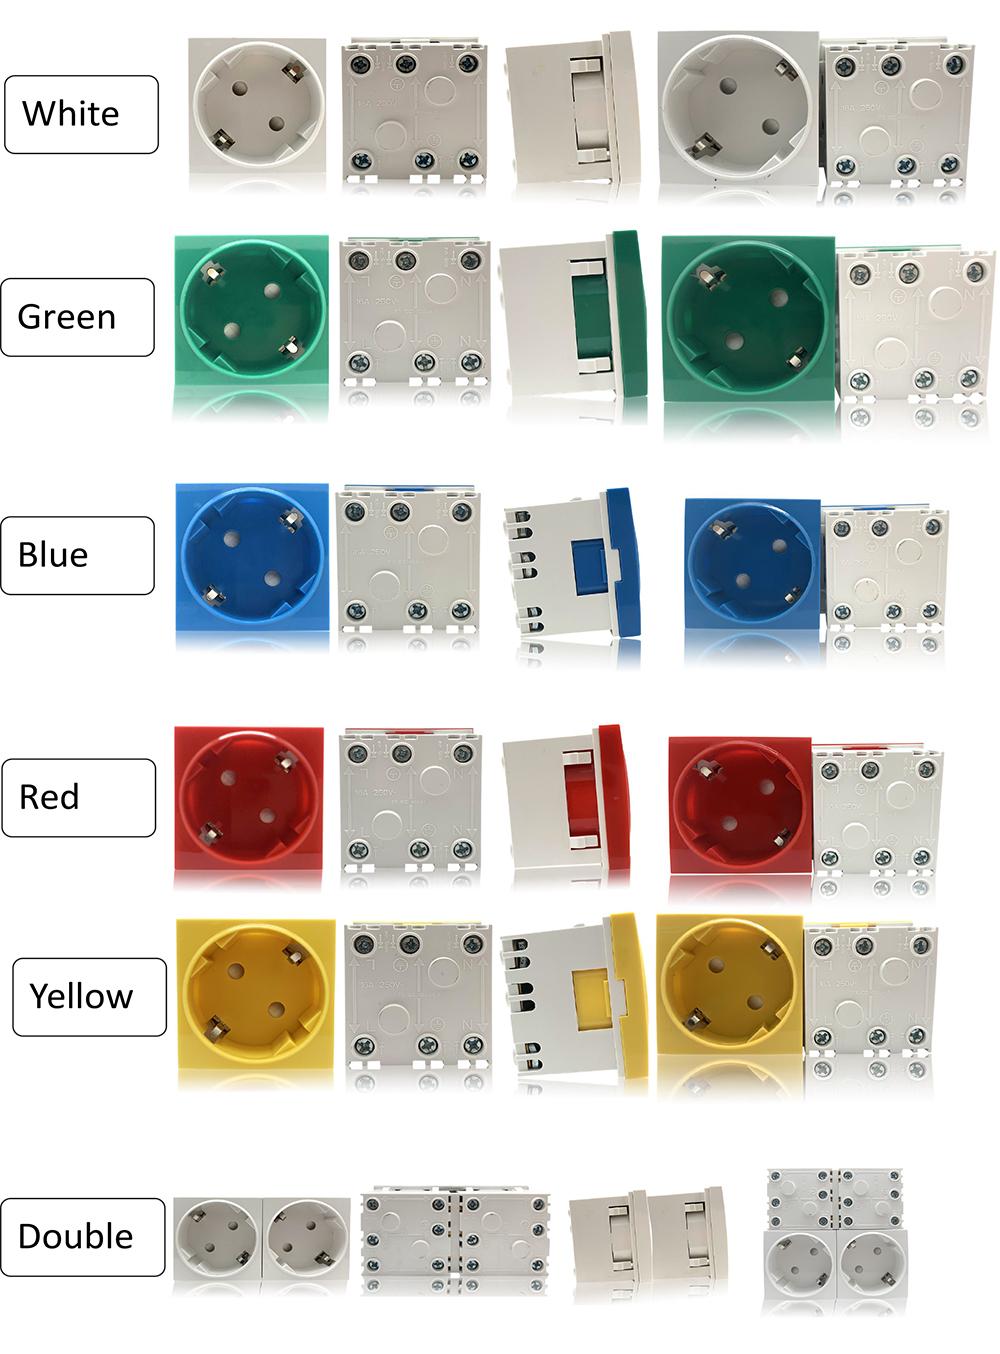 Safewire Datasheet 45 type  Safety shutter multi-sockets XJY-QB-35-1-2-3 M200505-4